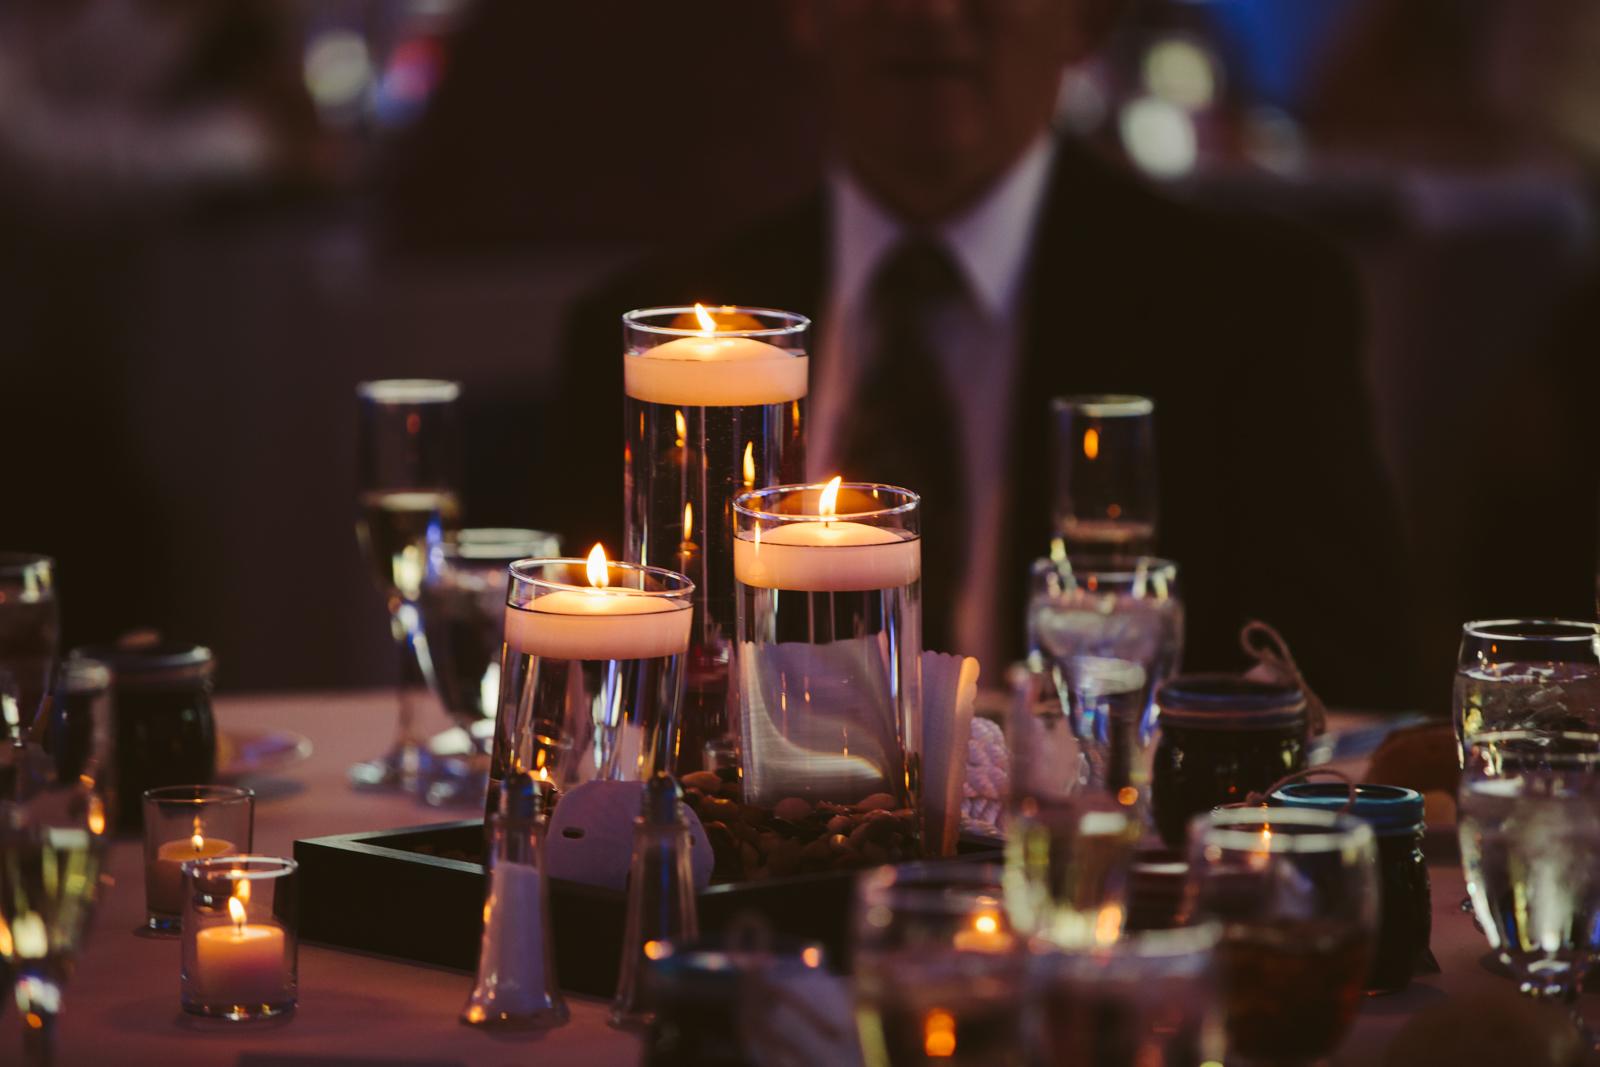 Eastons-Beach-Rotunda-Ballroom-Wedding-Newport-Rhode-Island-PhotographybyAmandaMorgan-99.jpg